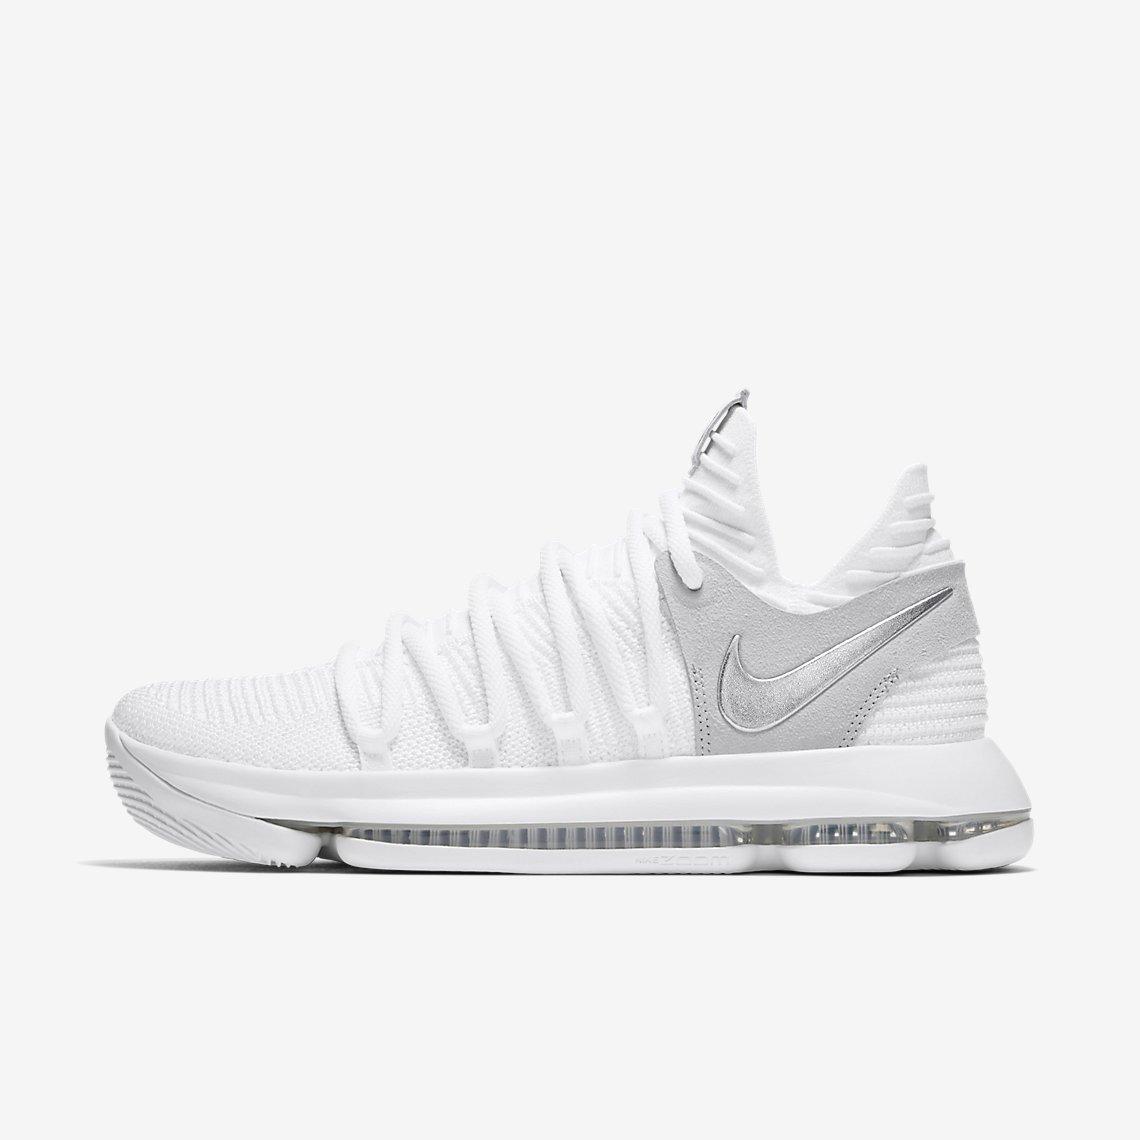 zoom-kdx-mens-basketball-shoe.jpg